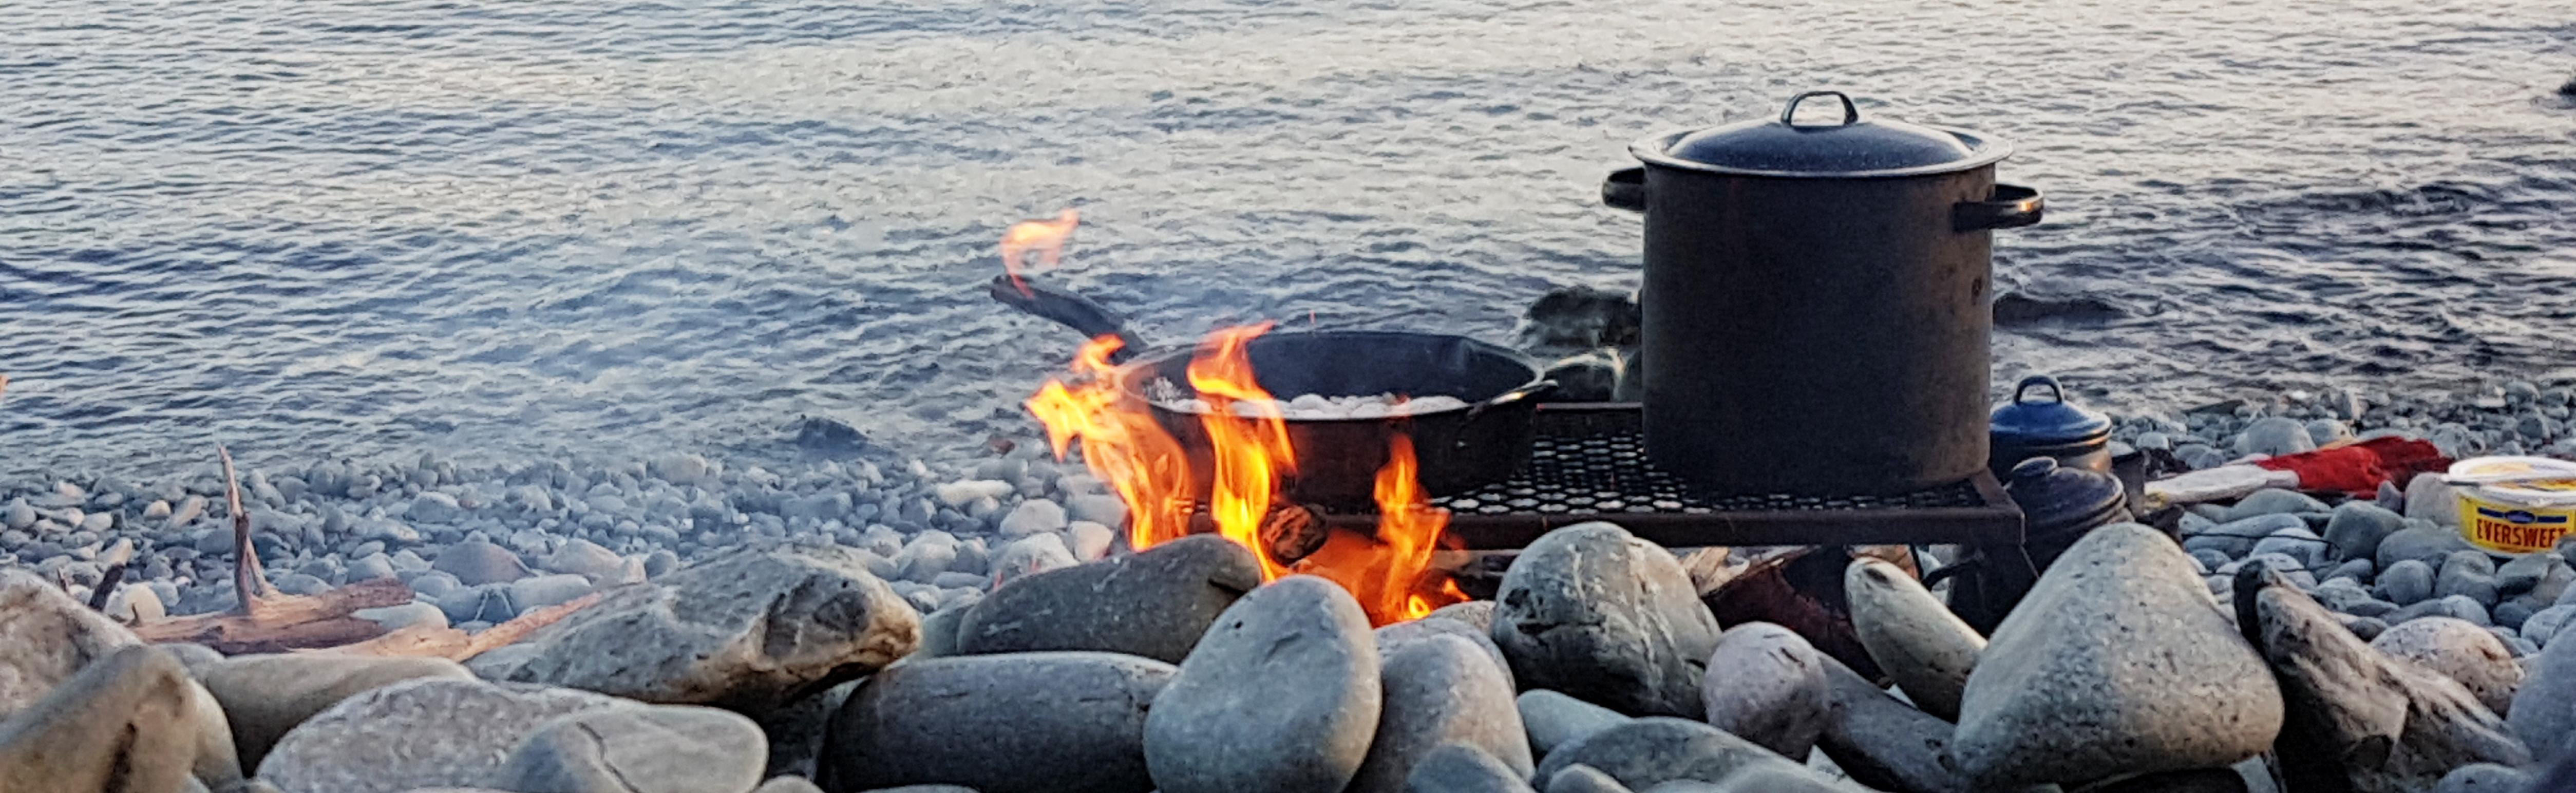 Sunset Beach Boil up - Bonavista Adventure Tours - Newfoundland